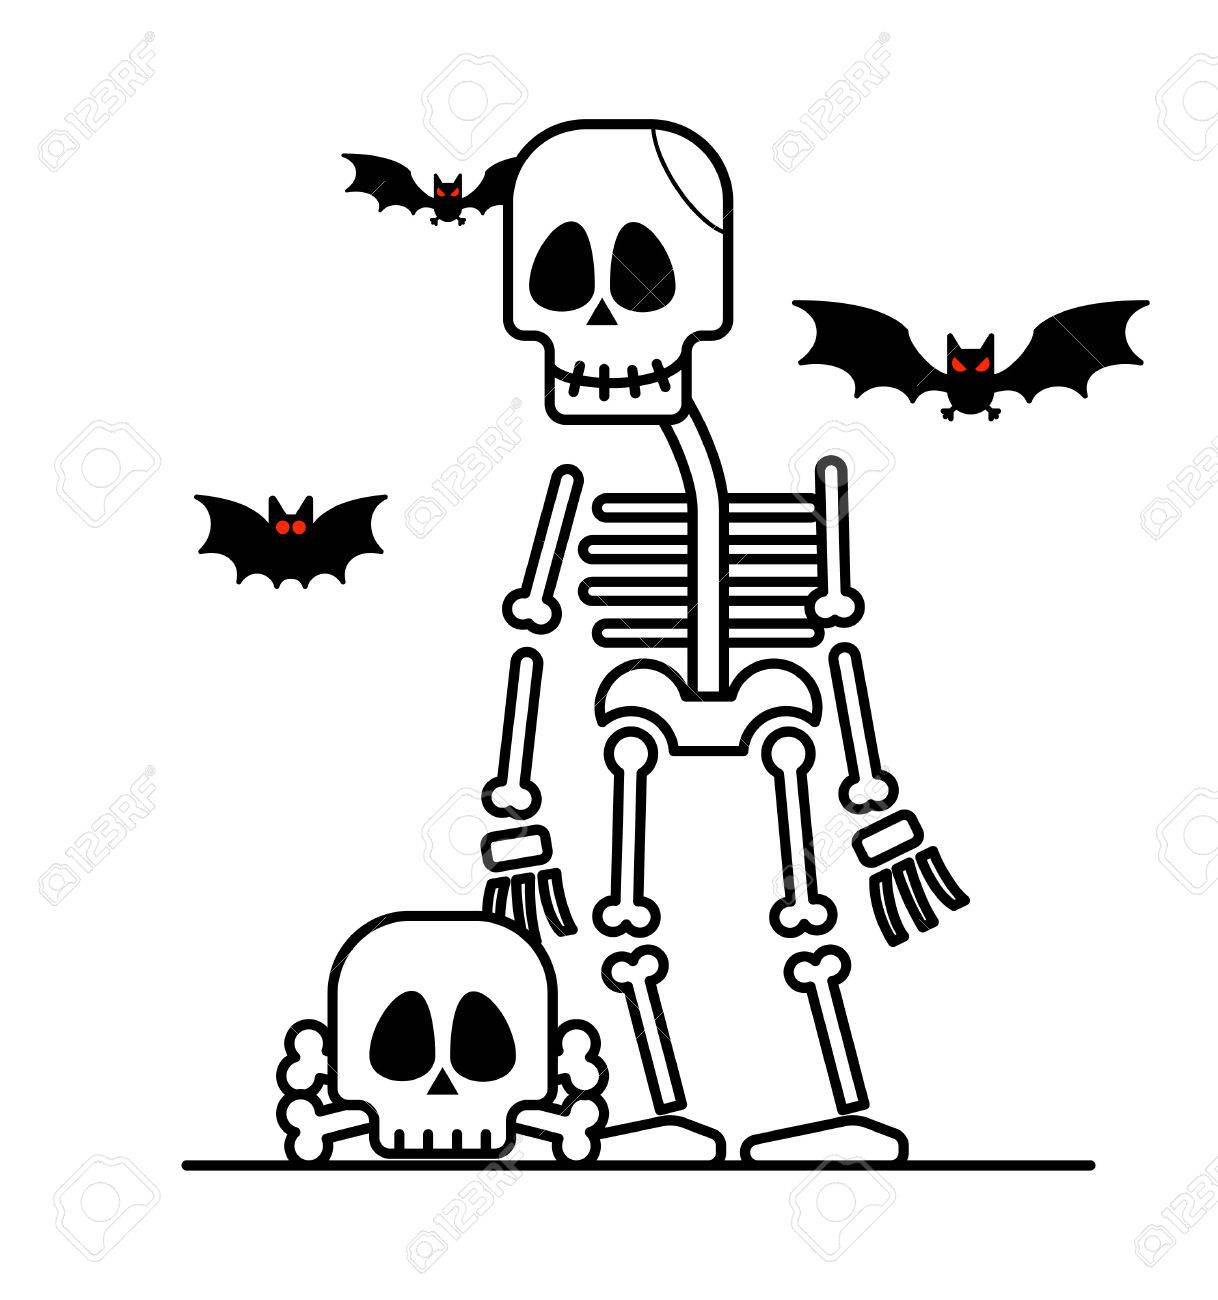 Halloween Skeleton.Halloween Skeleton Character